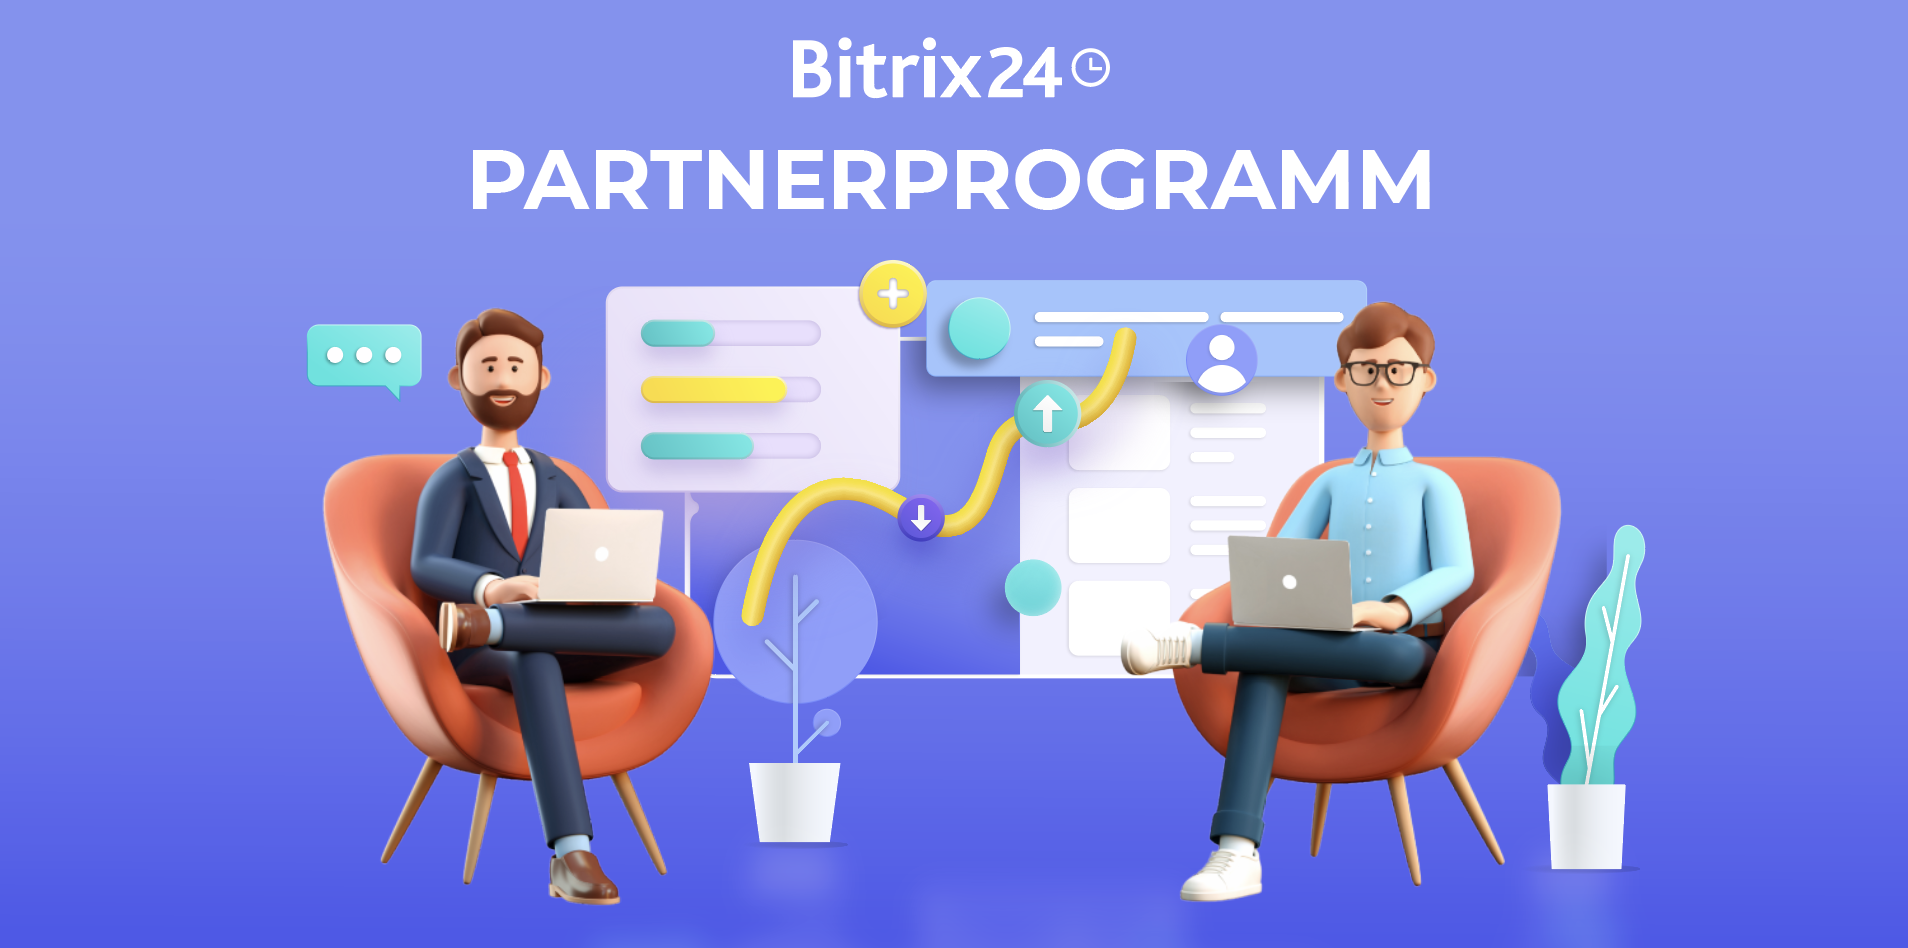 Bitrix24 Partnerprogramm